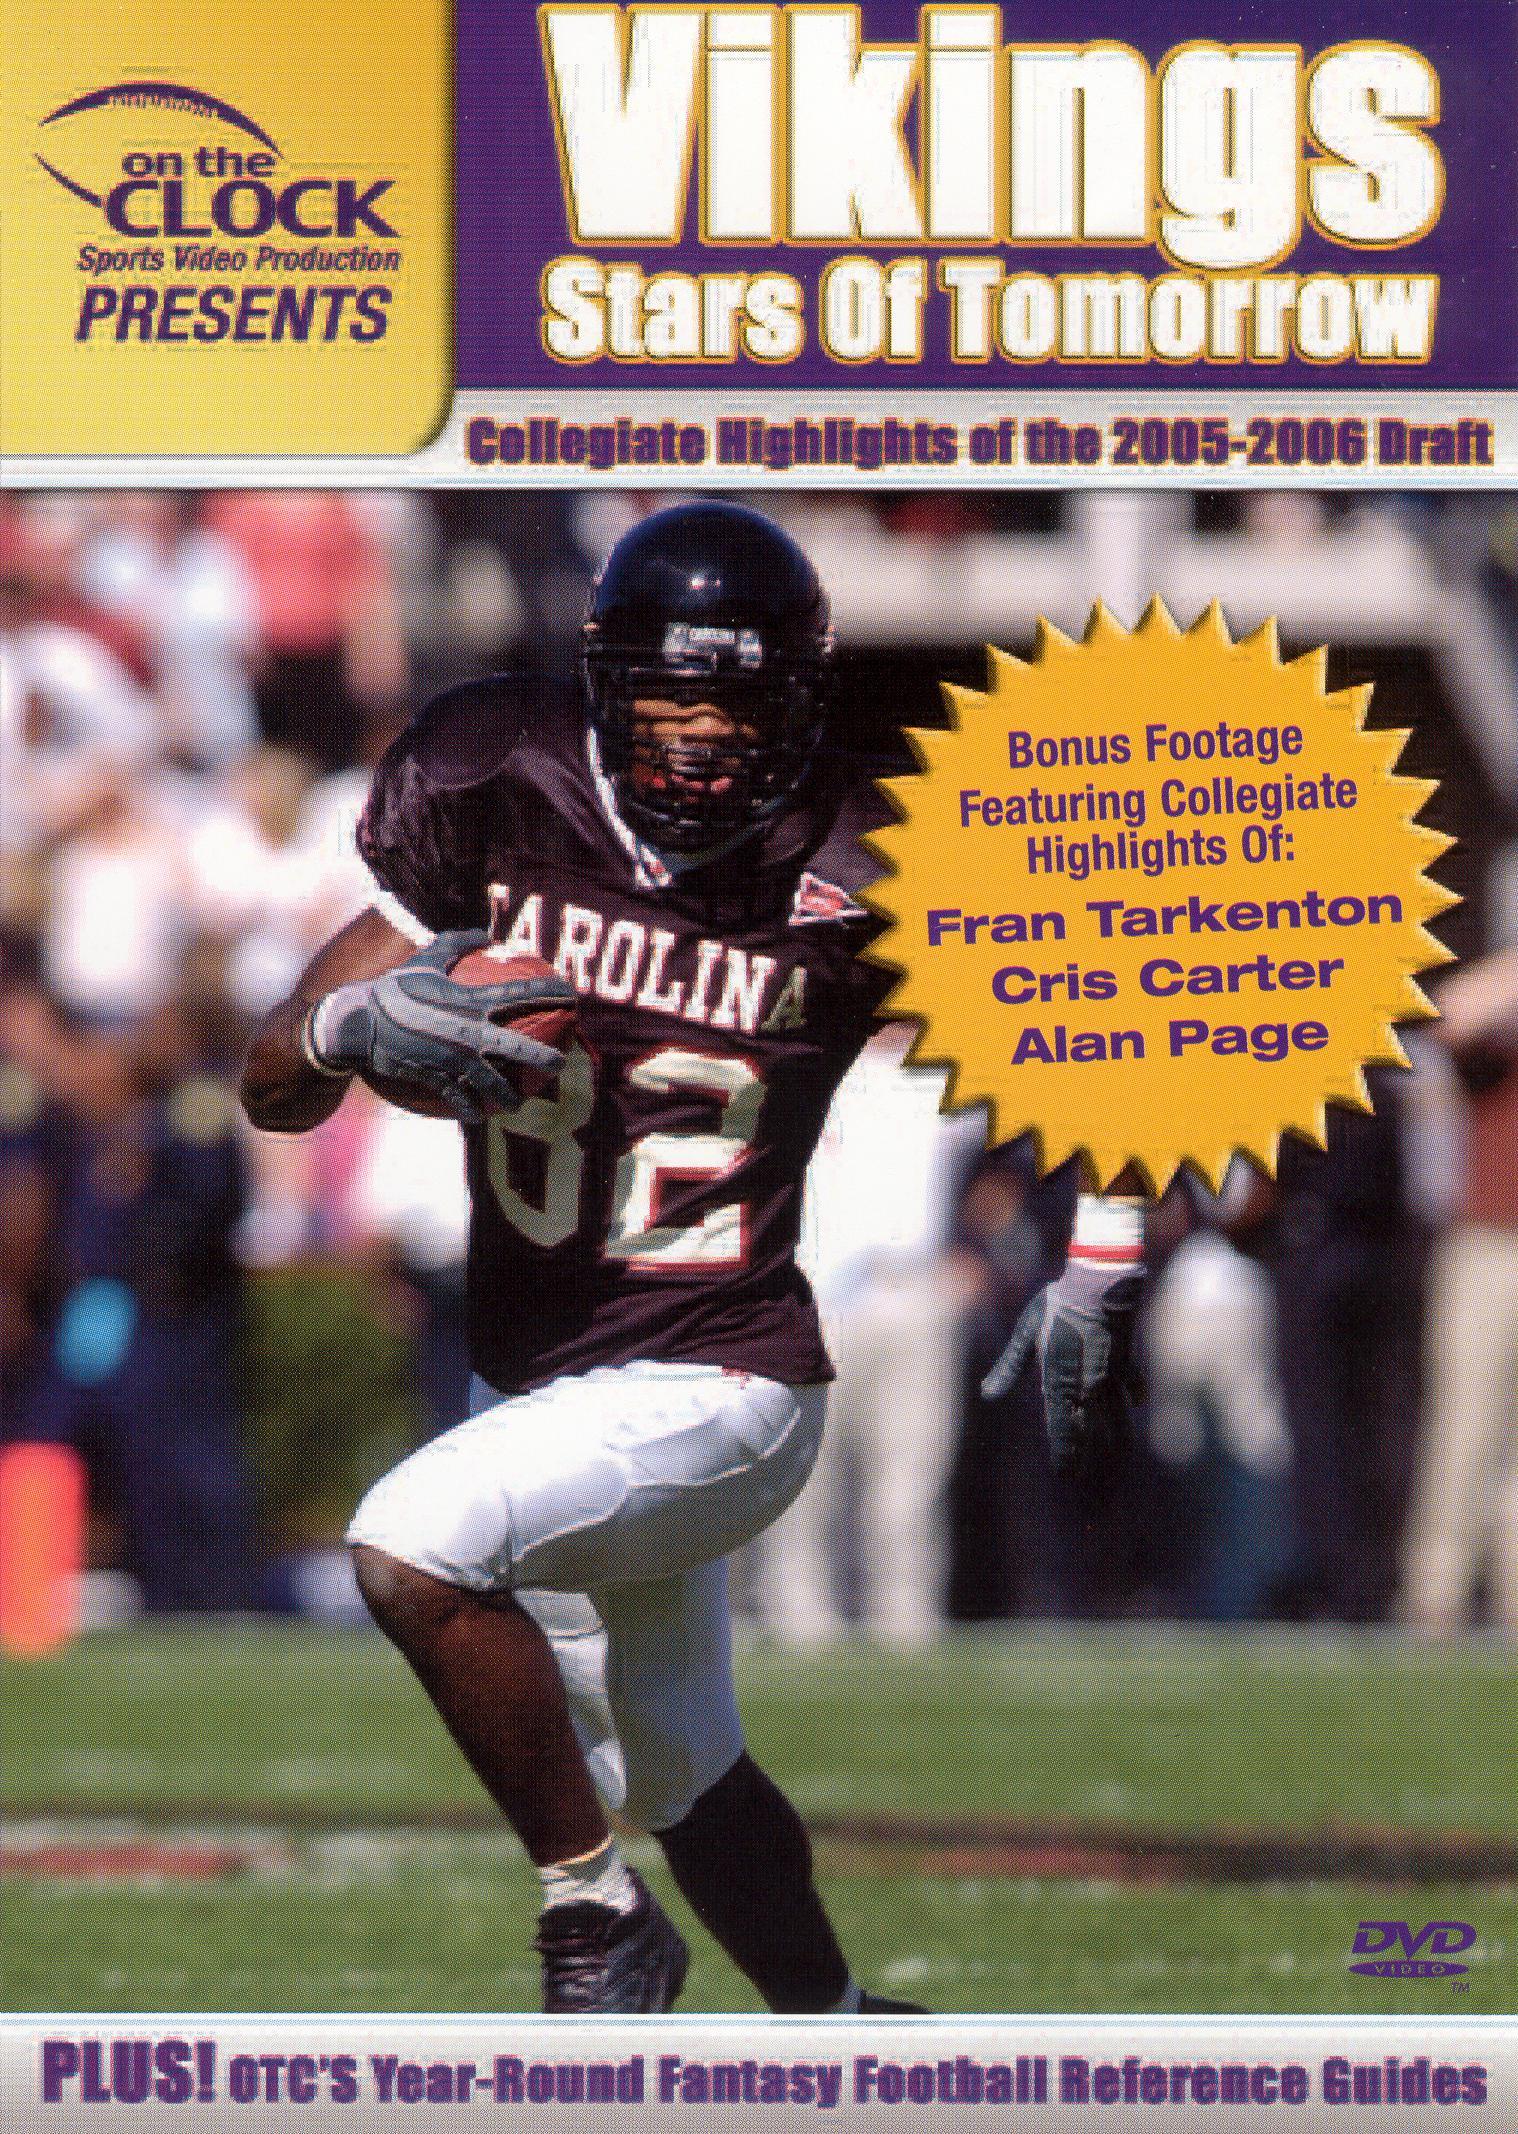 On the Clock Presents: Vikings - 2005 Draft Picks Collegiate Highlights